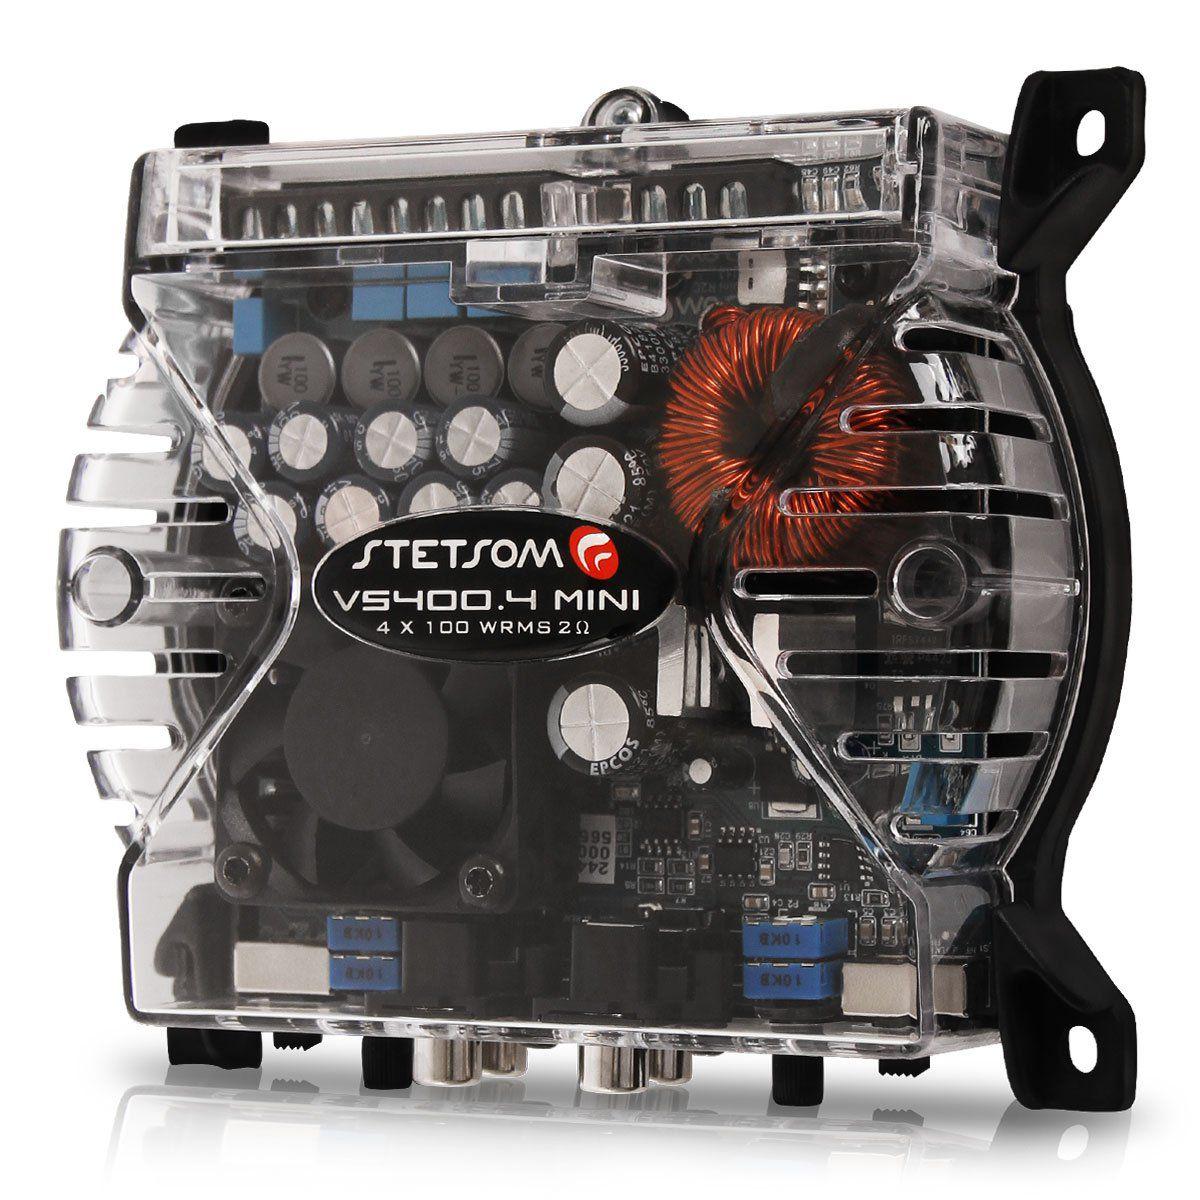 Modulo Amplificador Stetsom Vs400.4 Digital Mini 400W Rms 4 Canais 2 Ohm